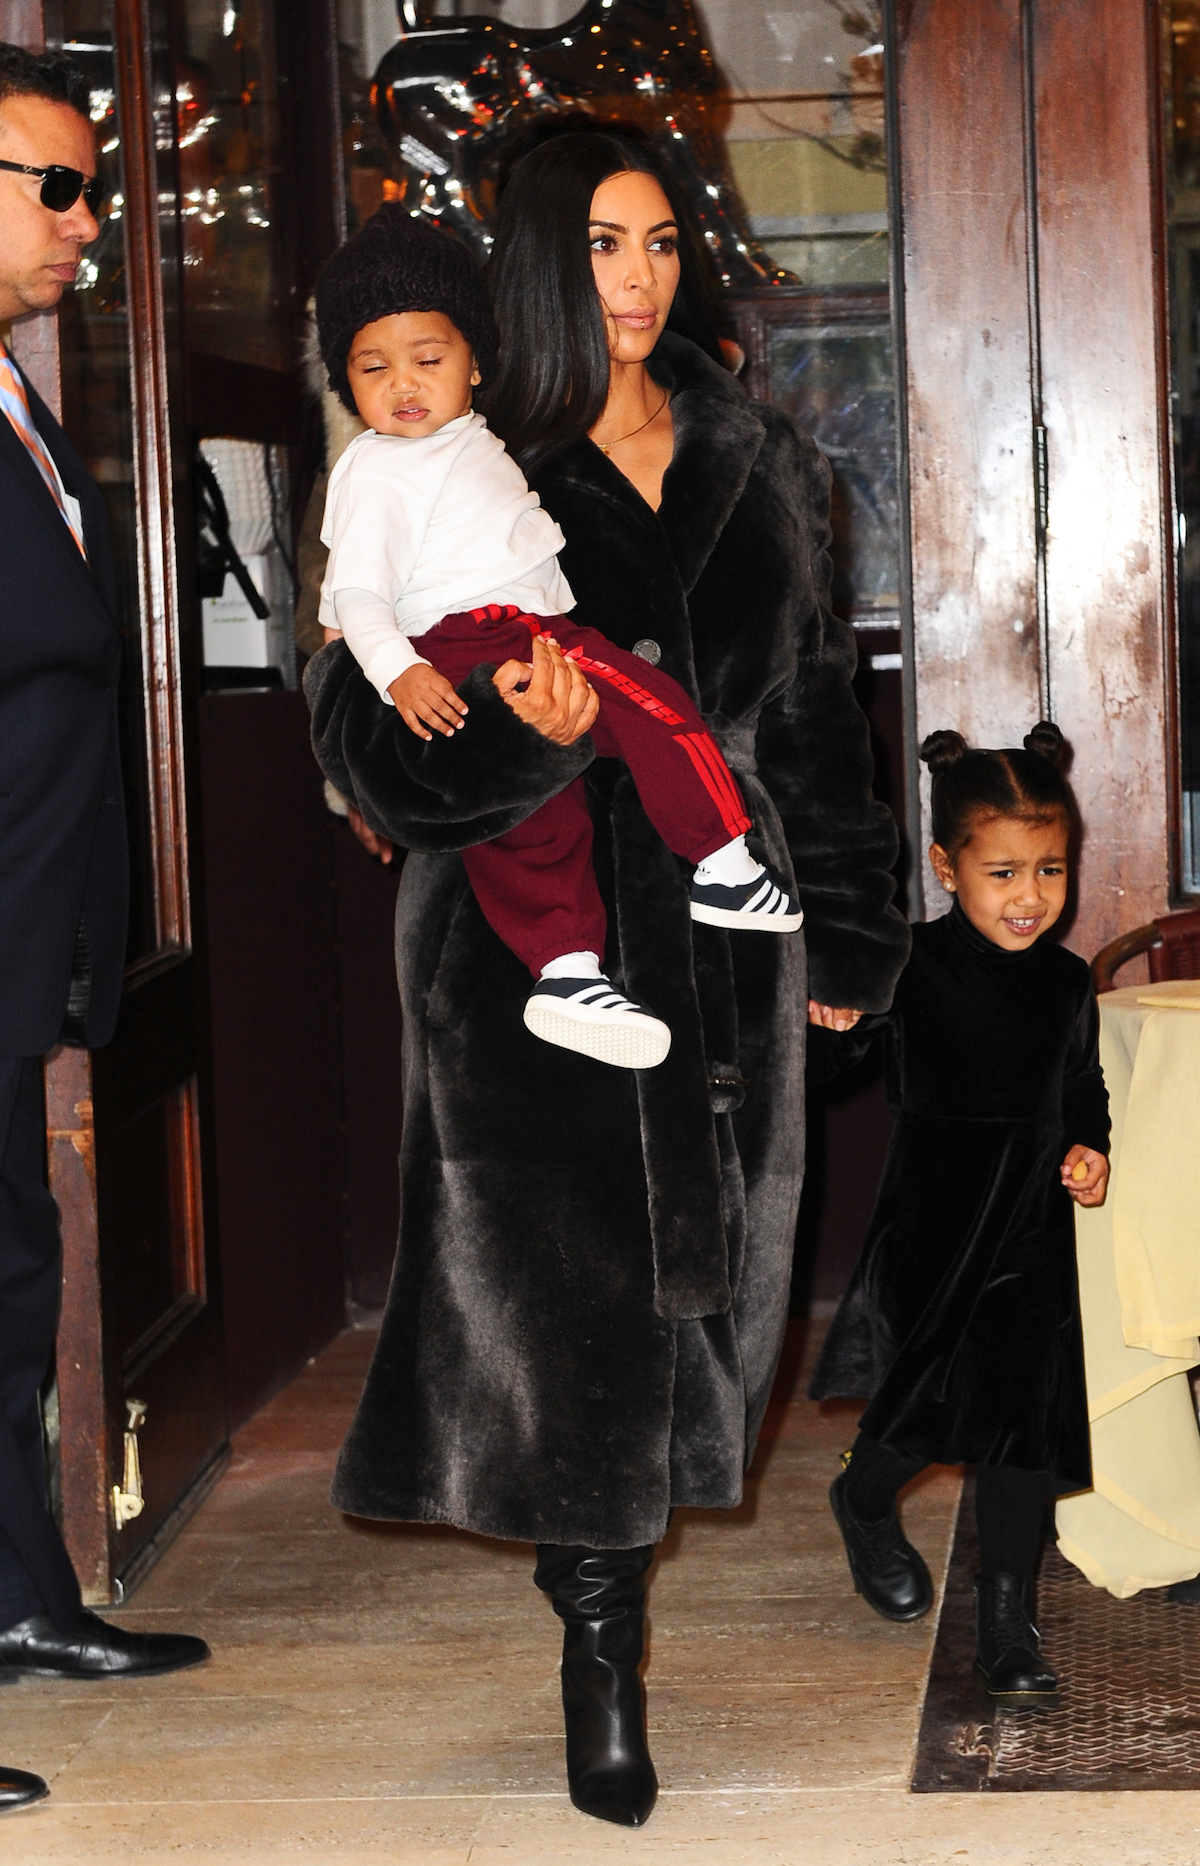 Kim Kardashian with children Saint West and North West in NYC. (Photo credit: Splash News)